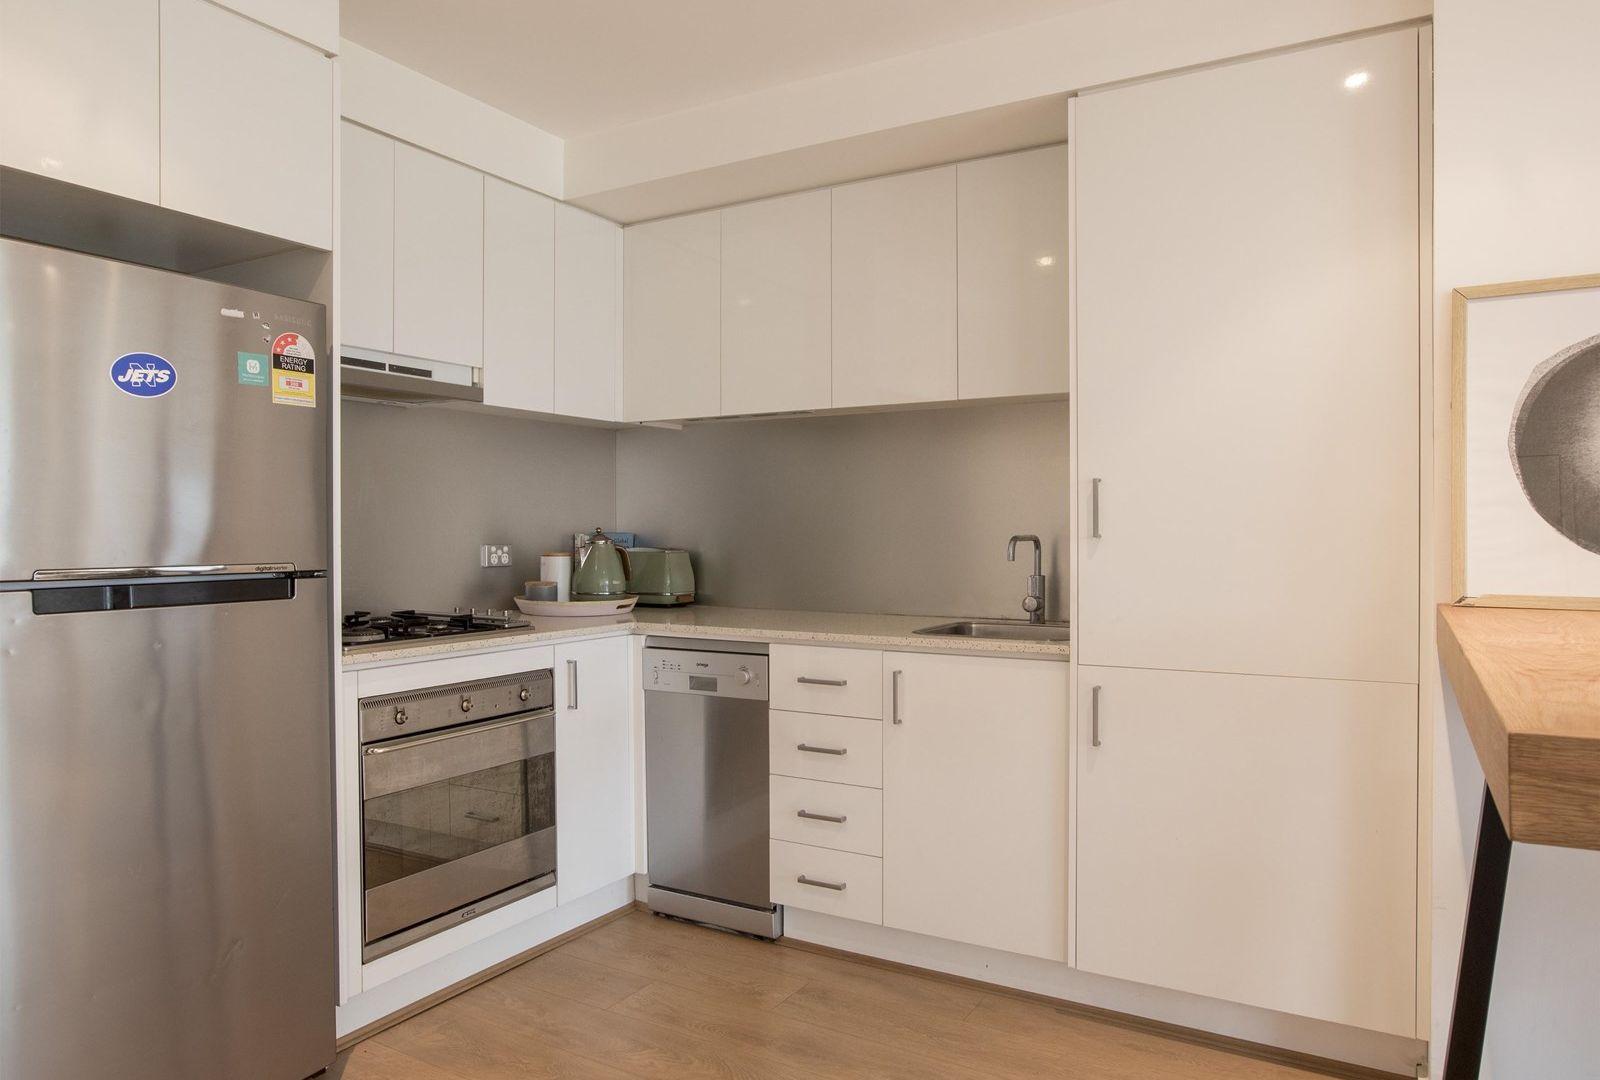 49/228 Moore Park  Road, Paddington NSW 2021, Image 1